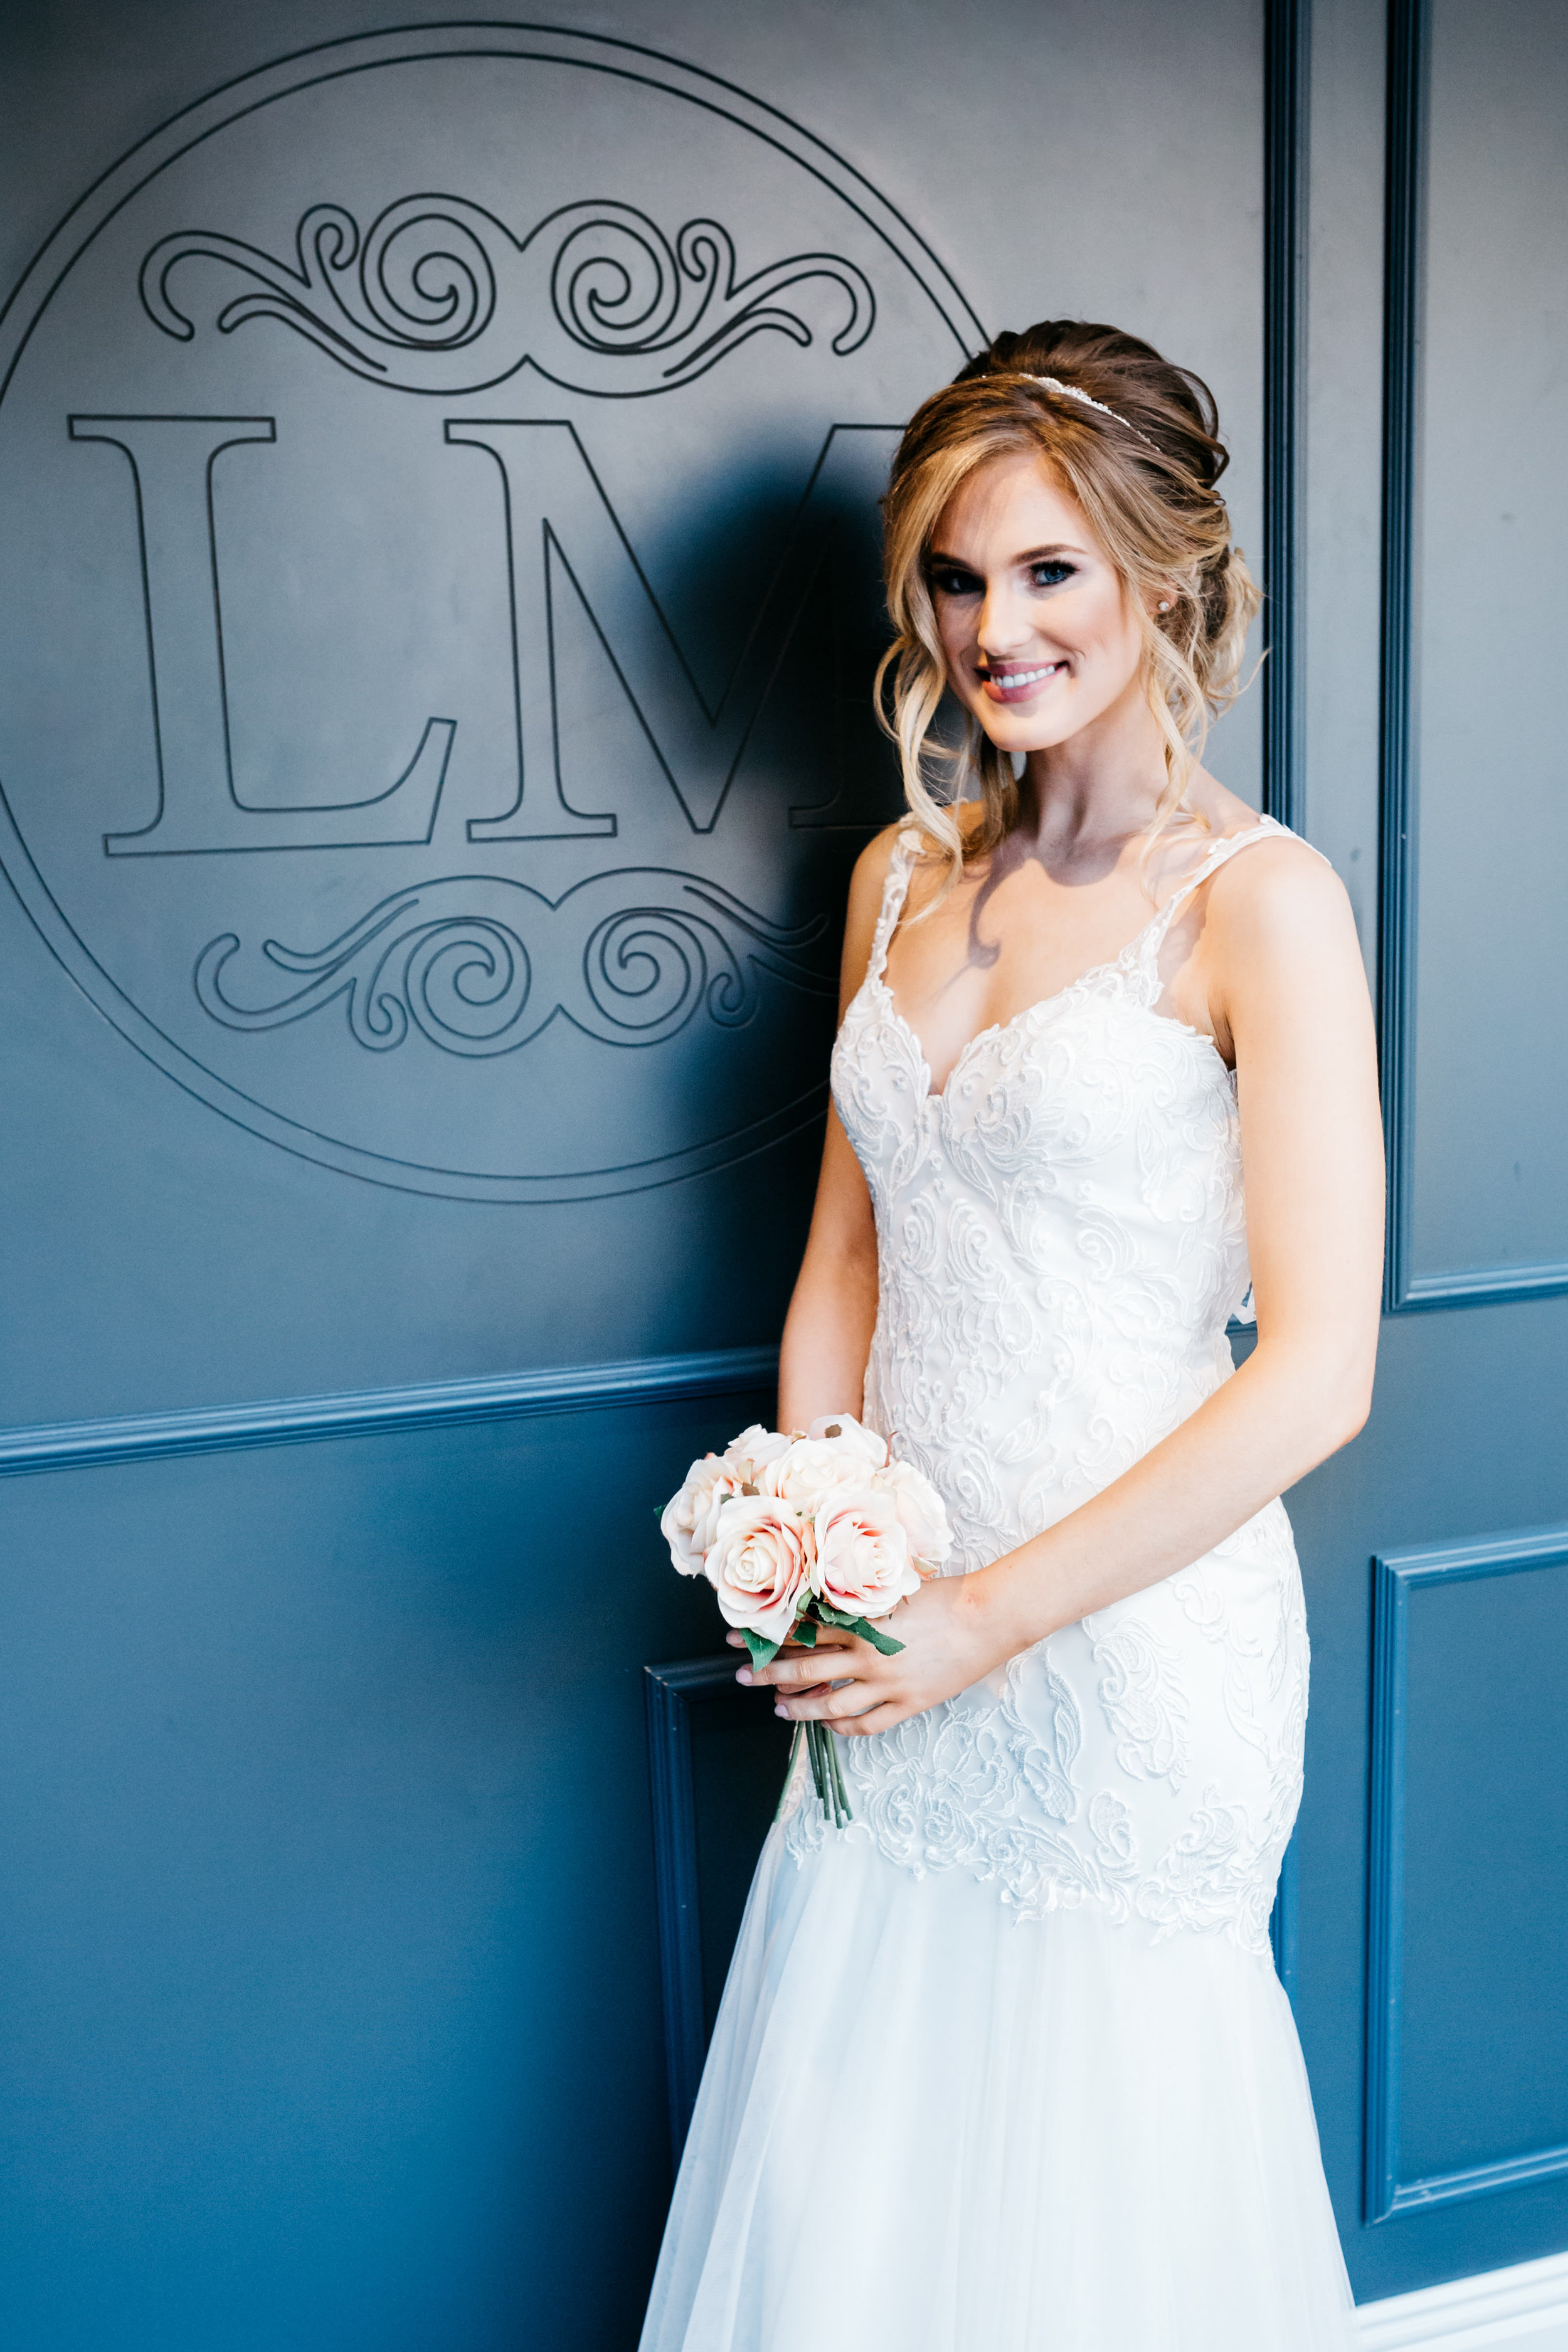 Wedding bride hair and make up la mode.jpg